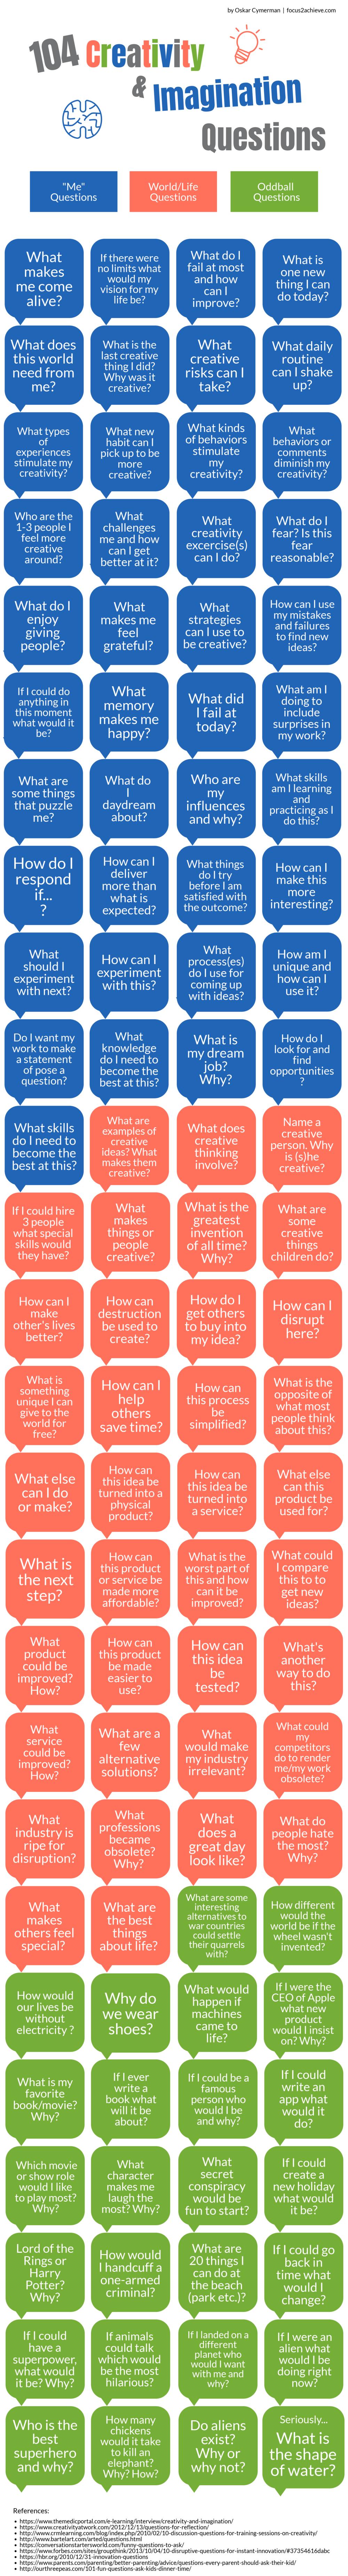 104 Creativity & Imagination Questions